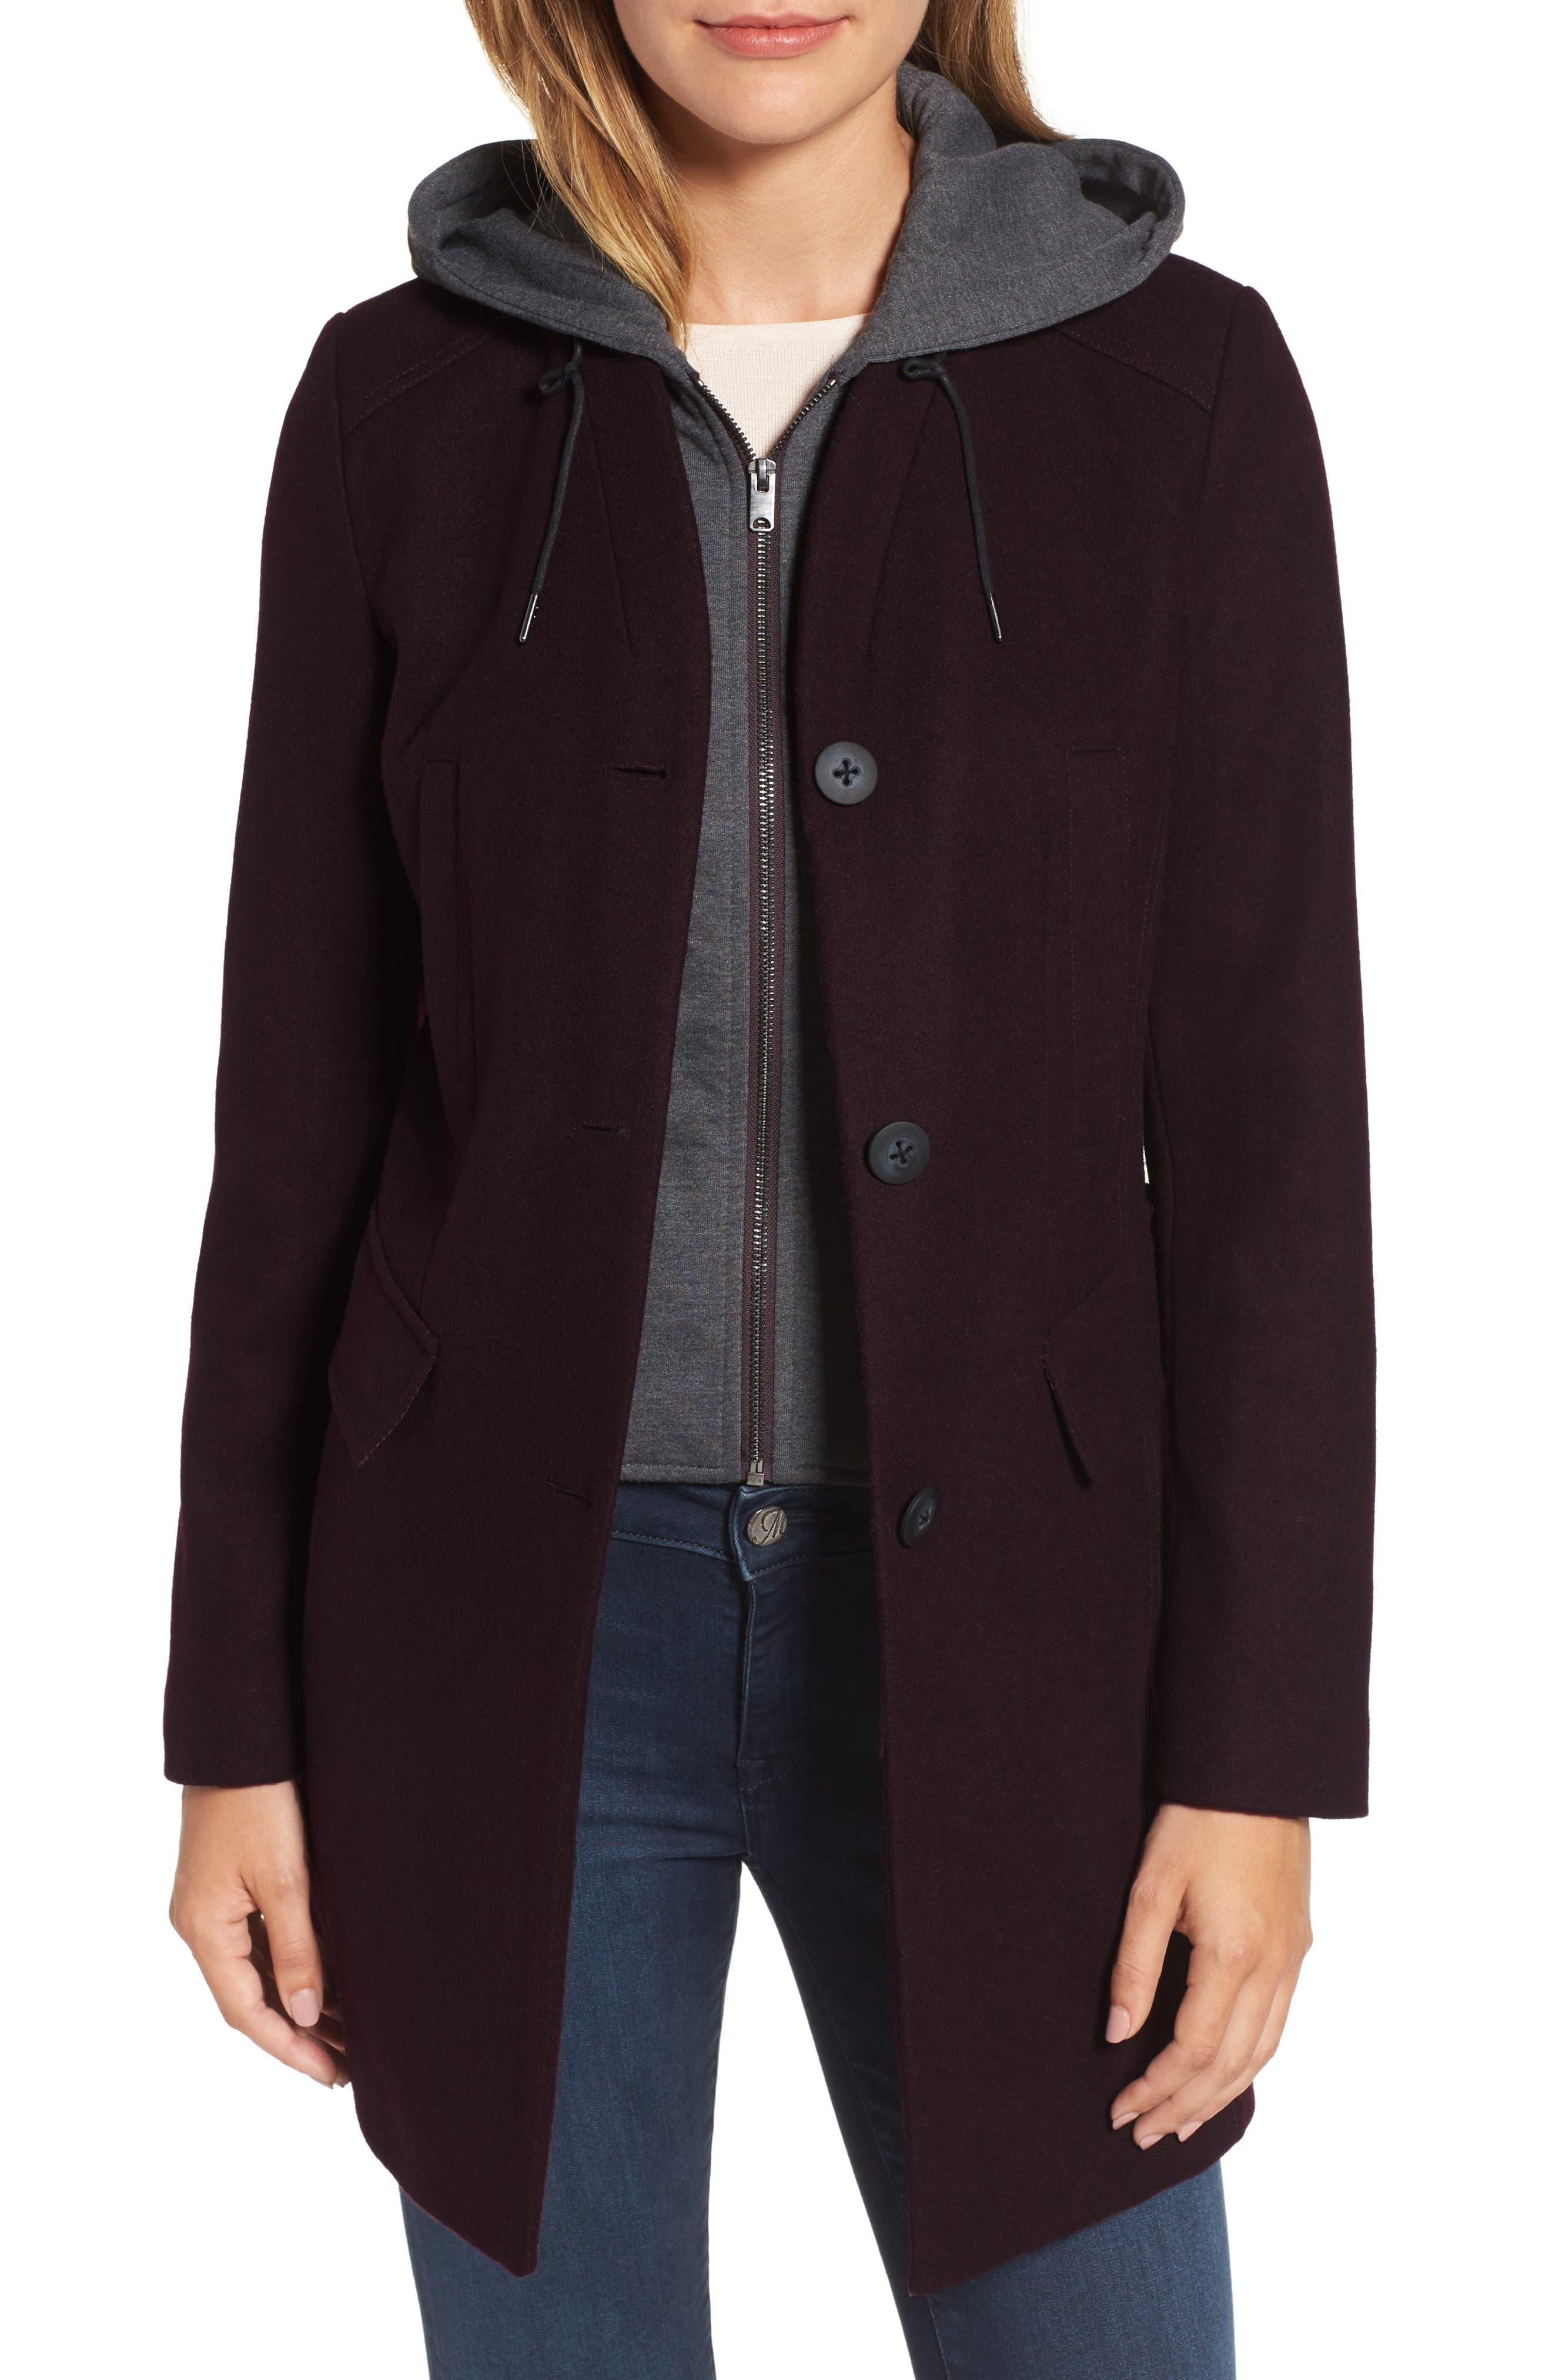 Andrew Marc Roxanne Wool 2-in-1 Car Coat